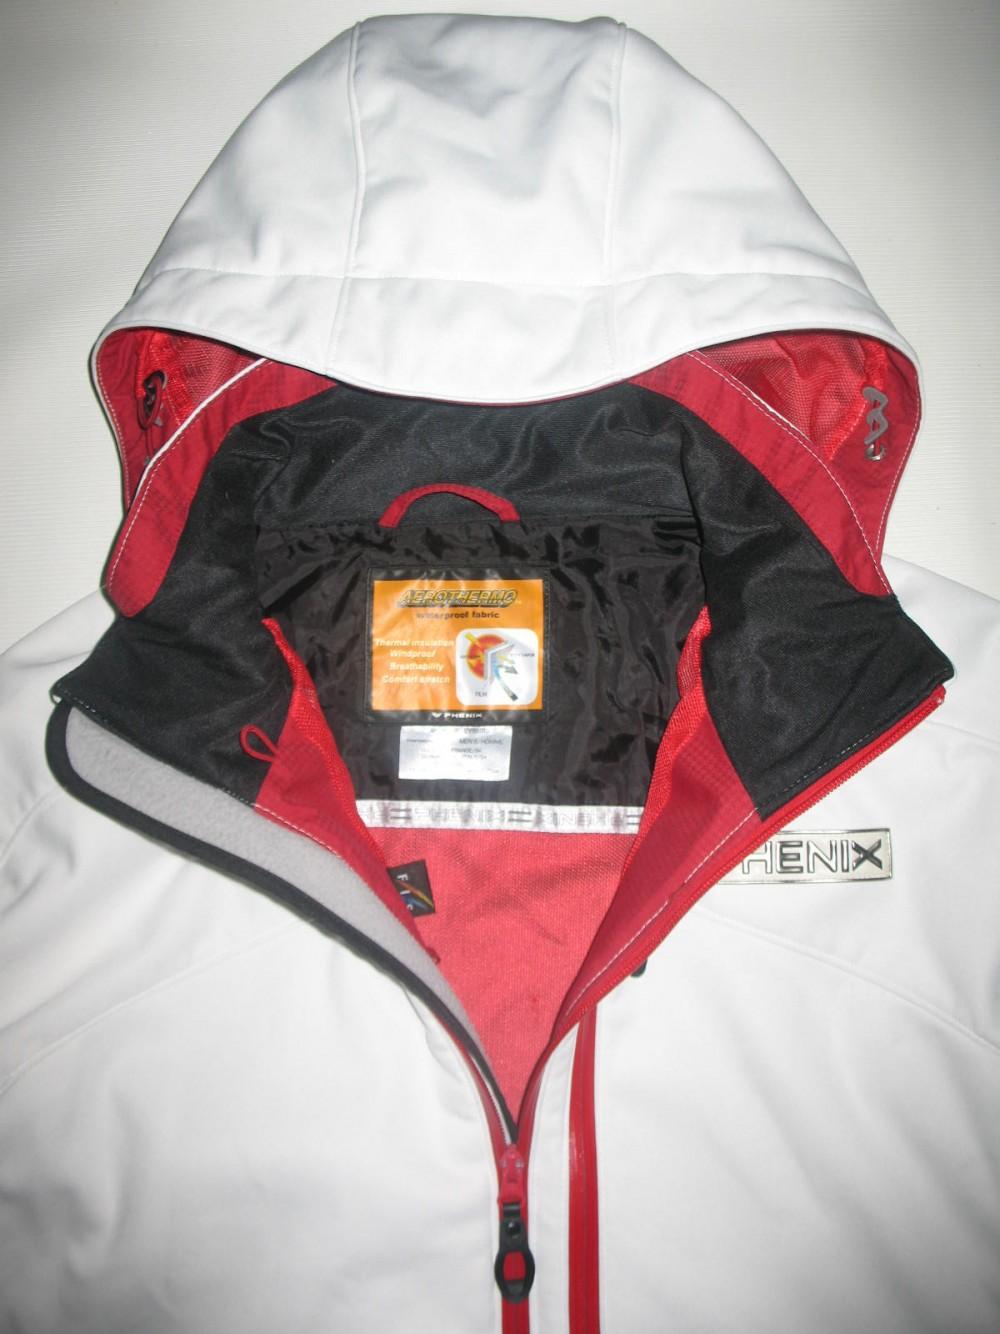 Куртка PHENIX f.i.s. softshell jacket (размер XL) - 3